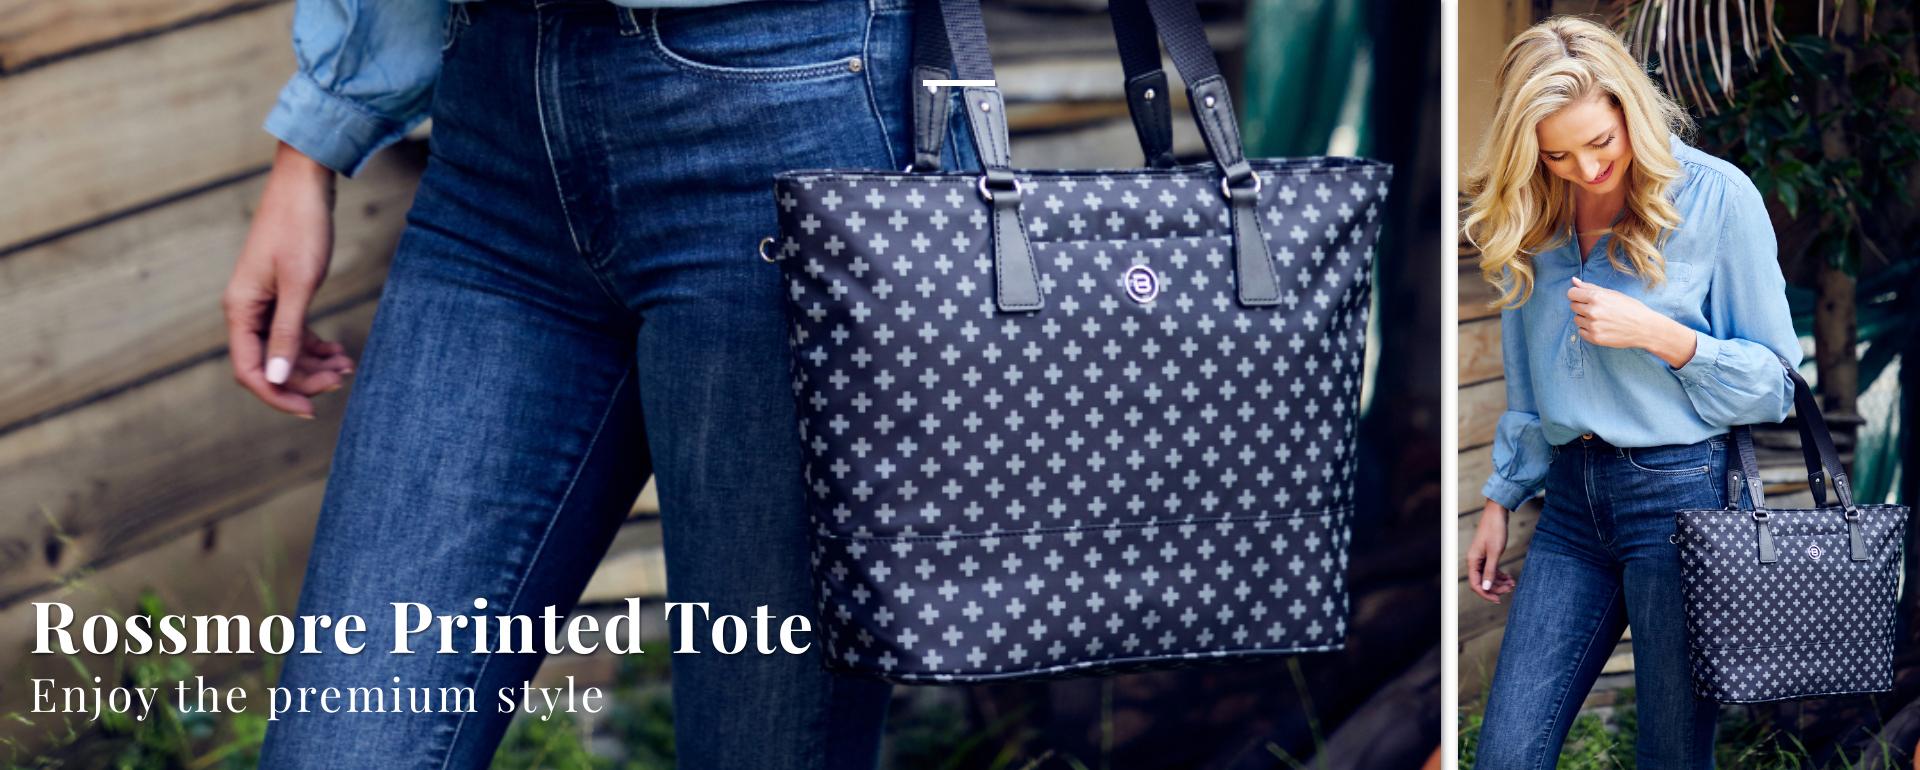 beside-u BNUA185-162 Rossmore Black Cross Printed Tote purses fashion handbags designer bags spring banner